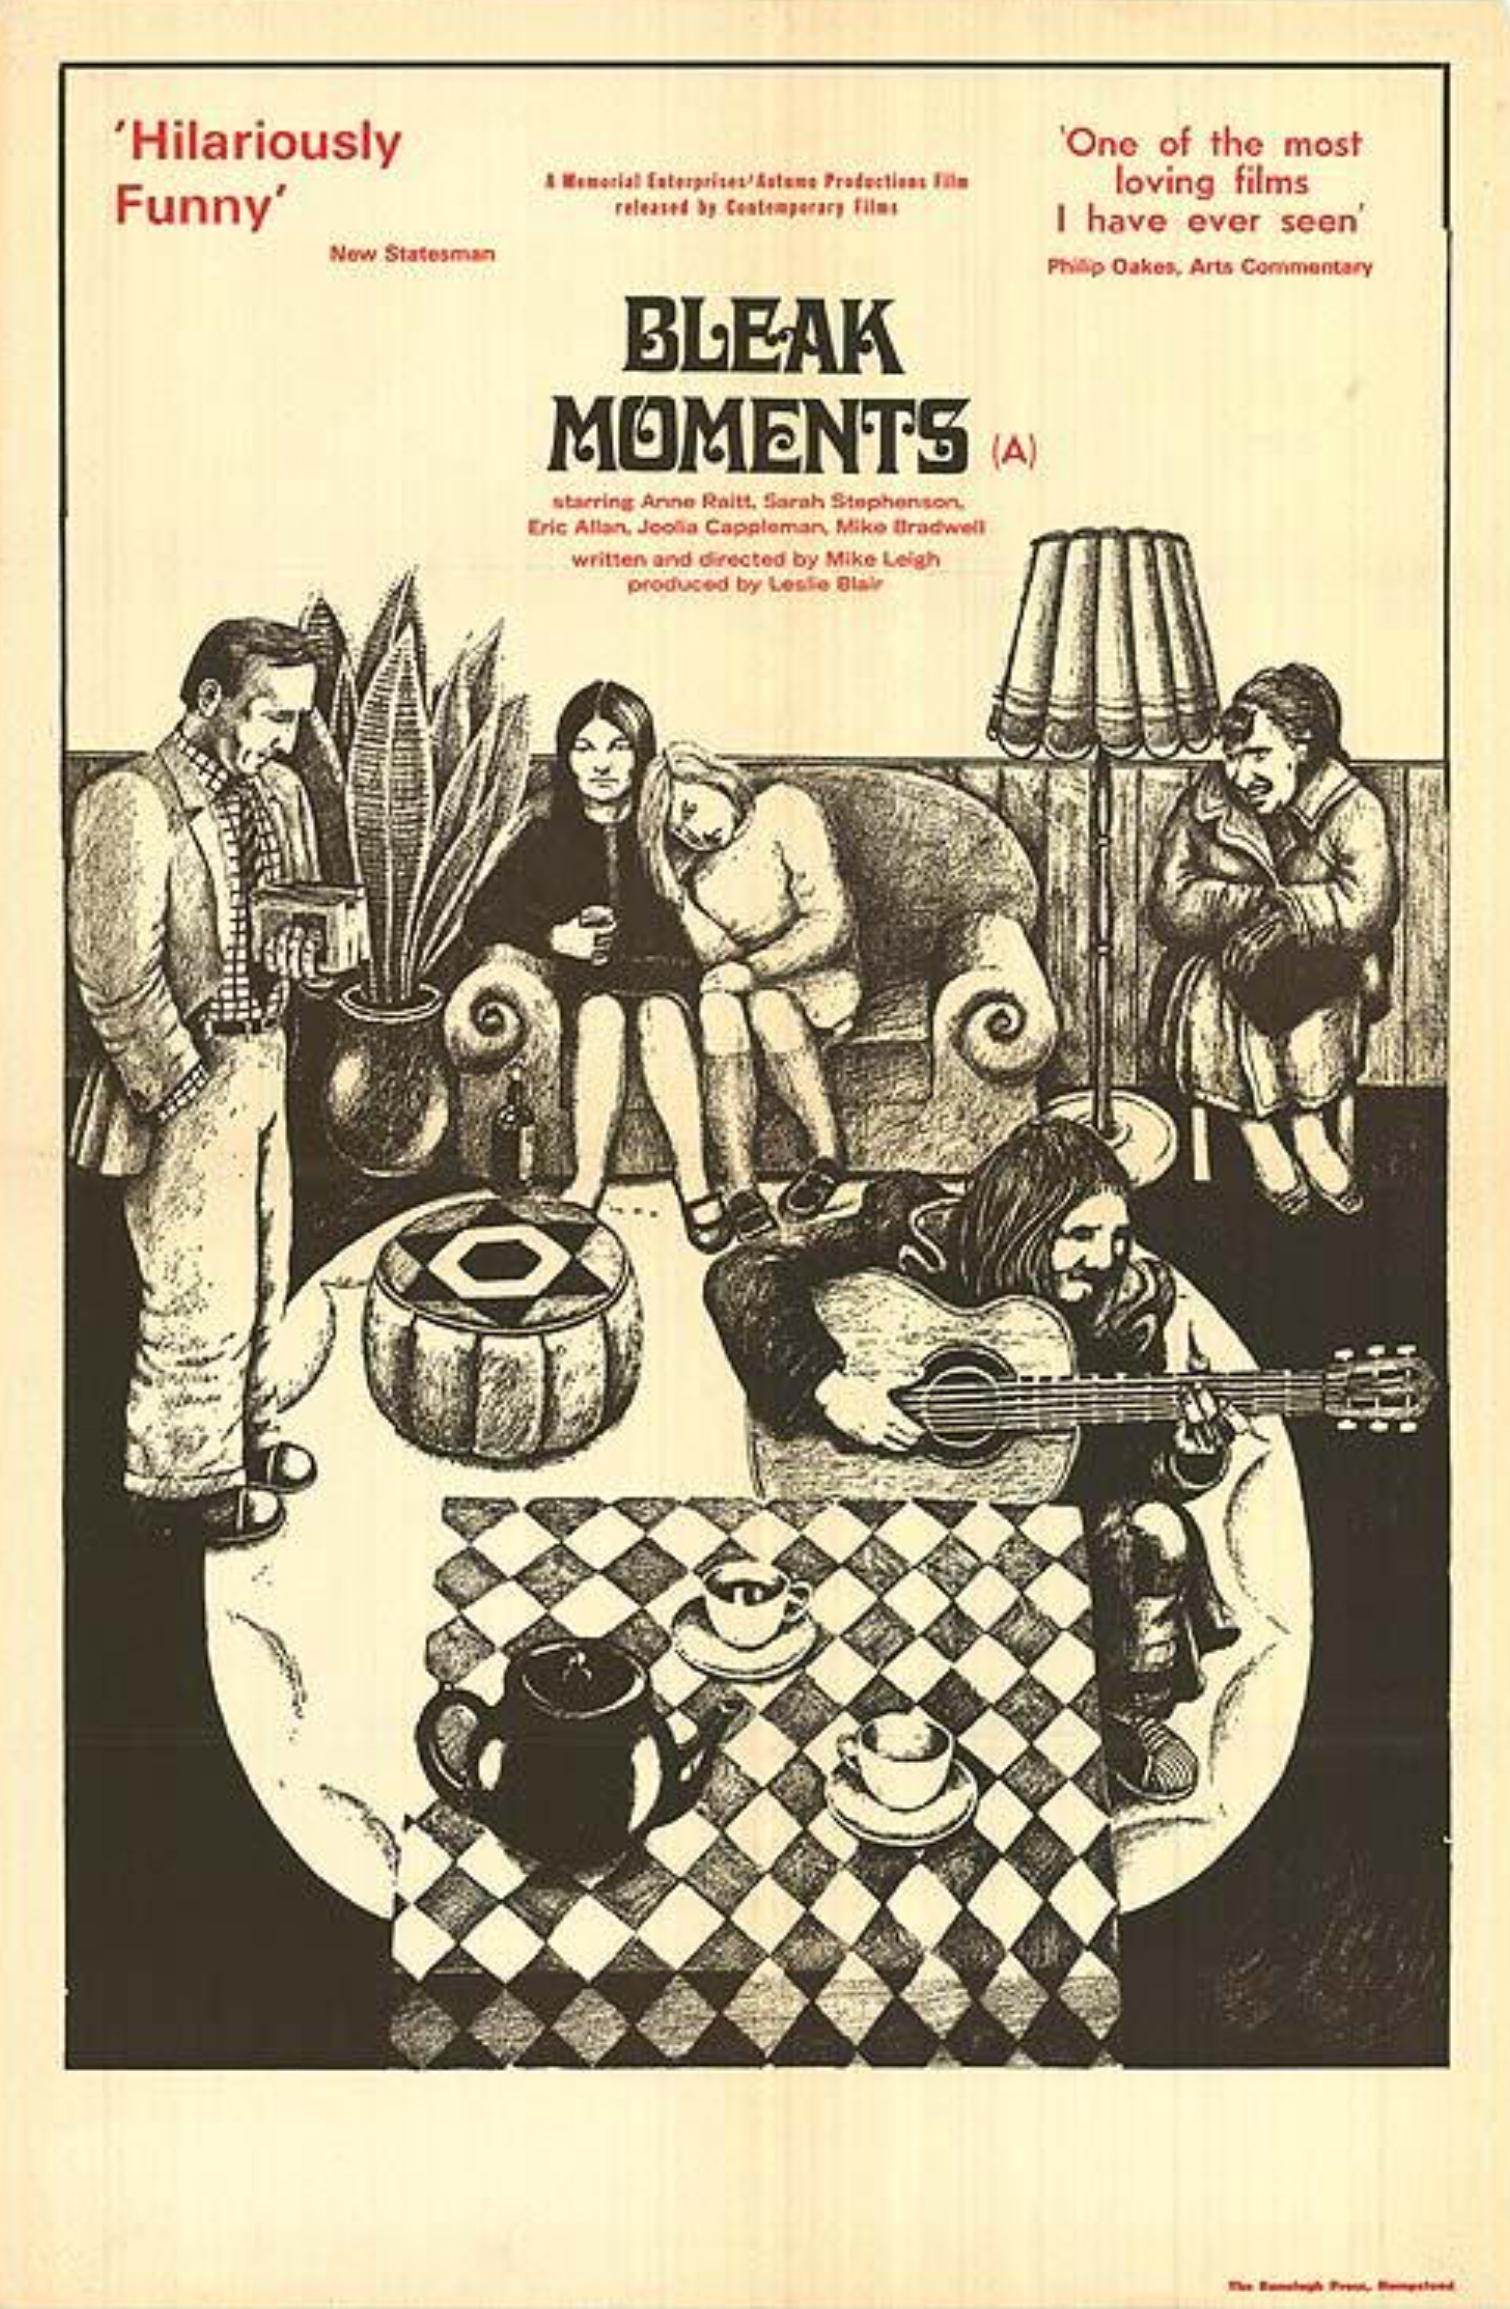 دانلود زیرنویس فارسی فیلم Bleak Moments